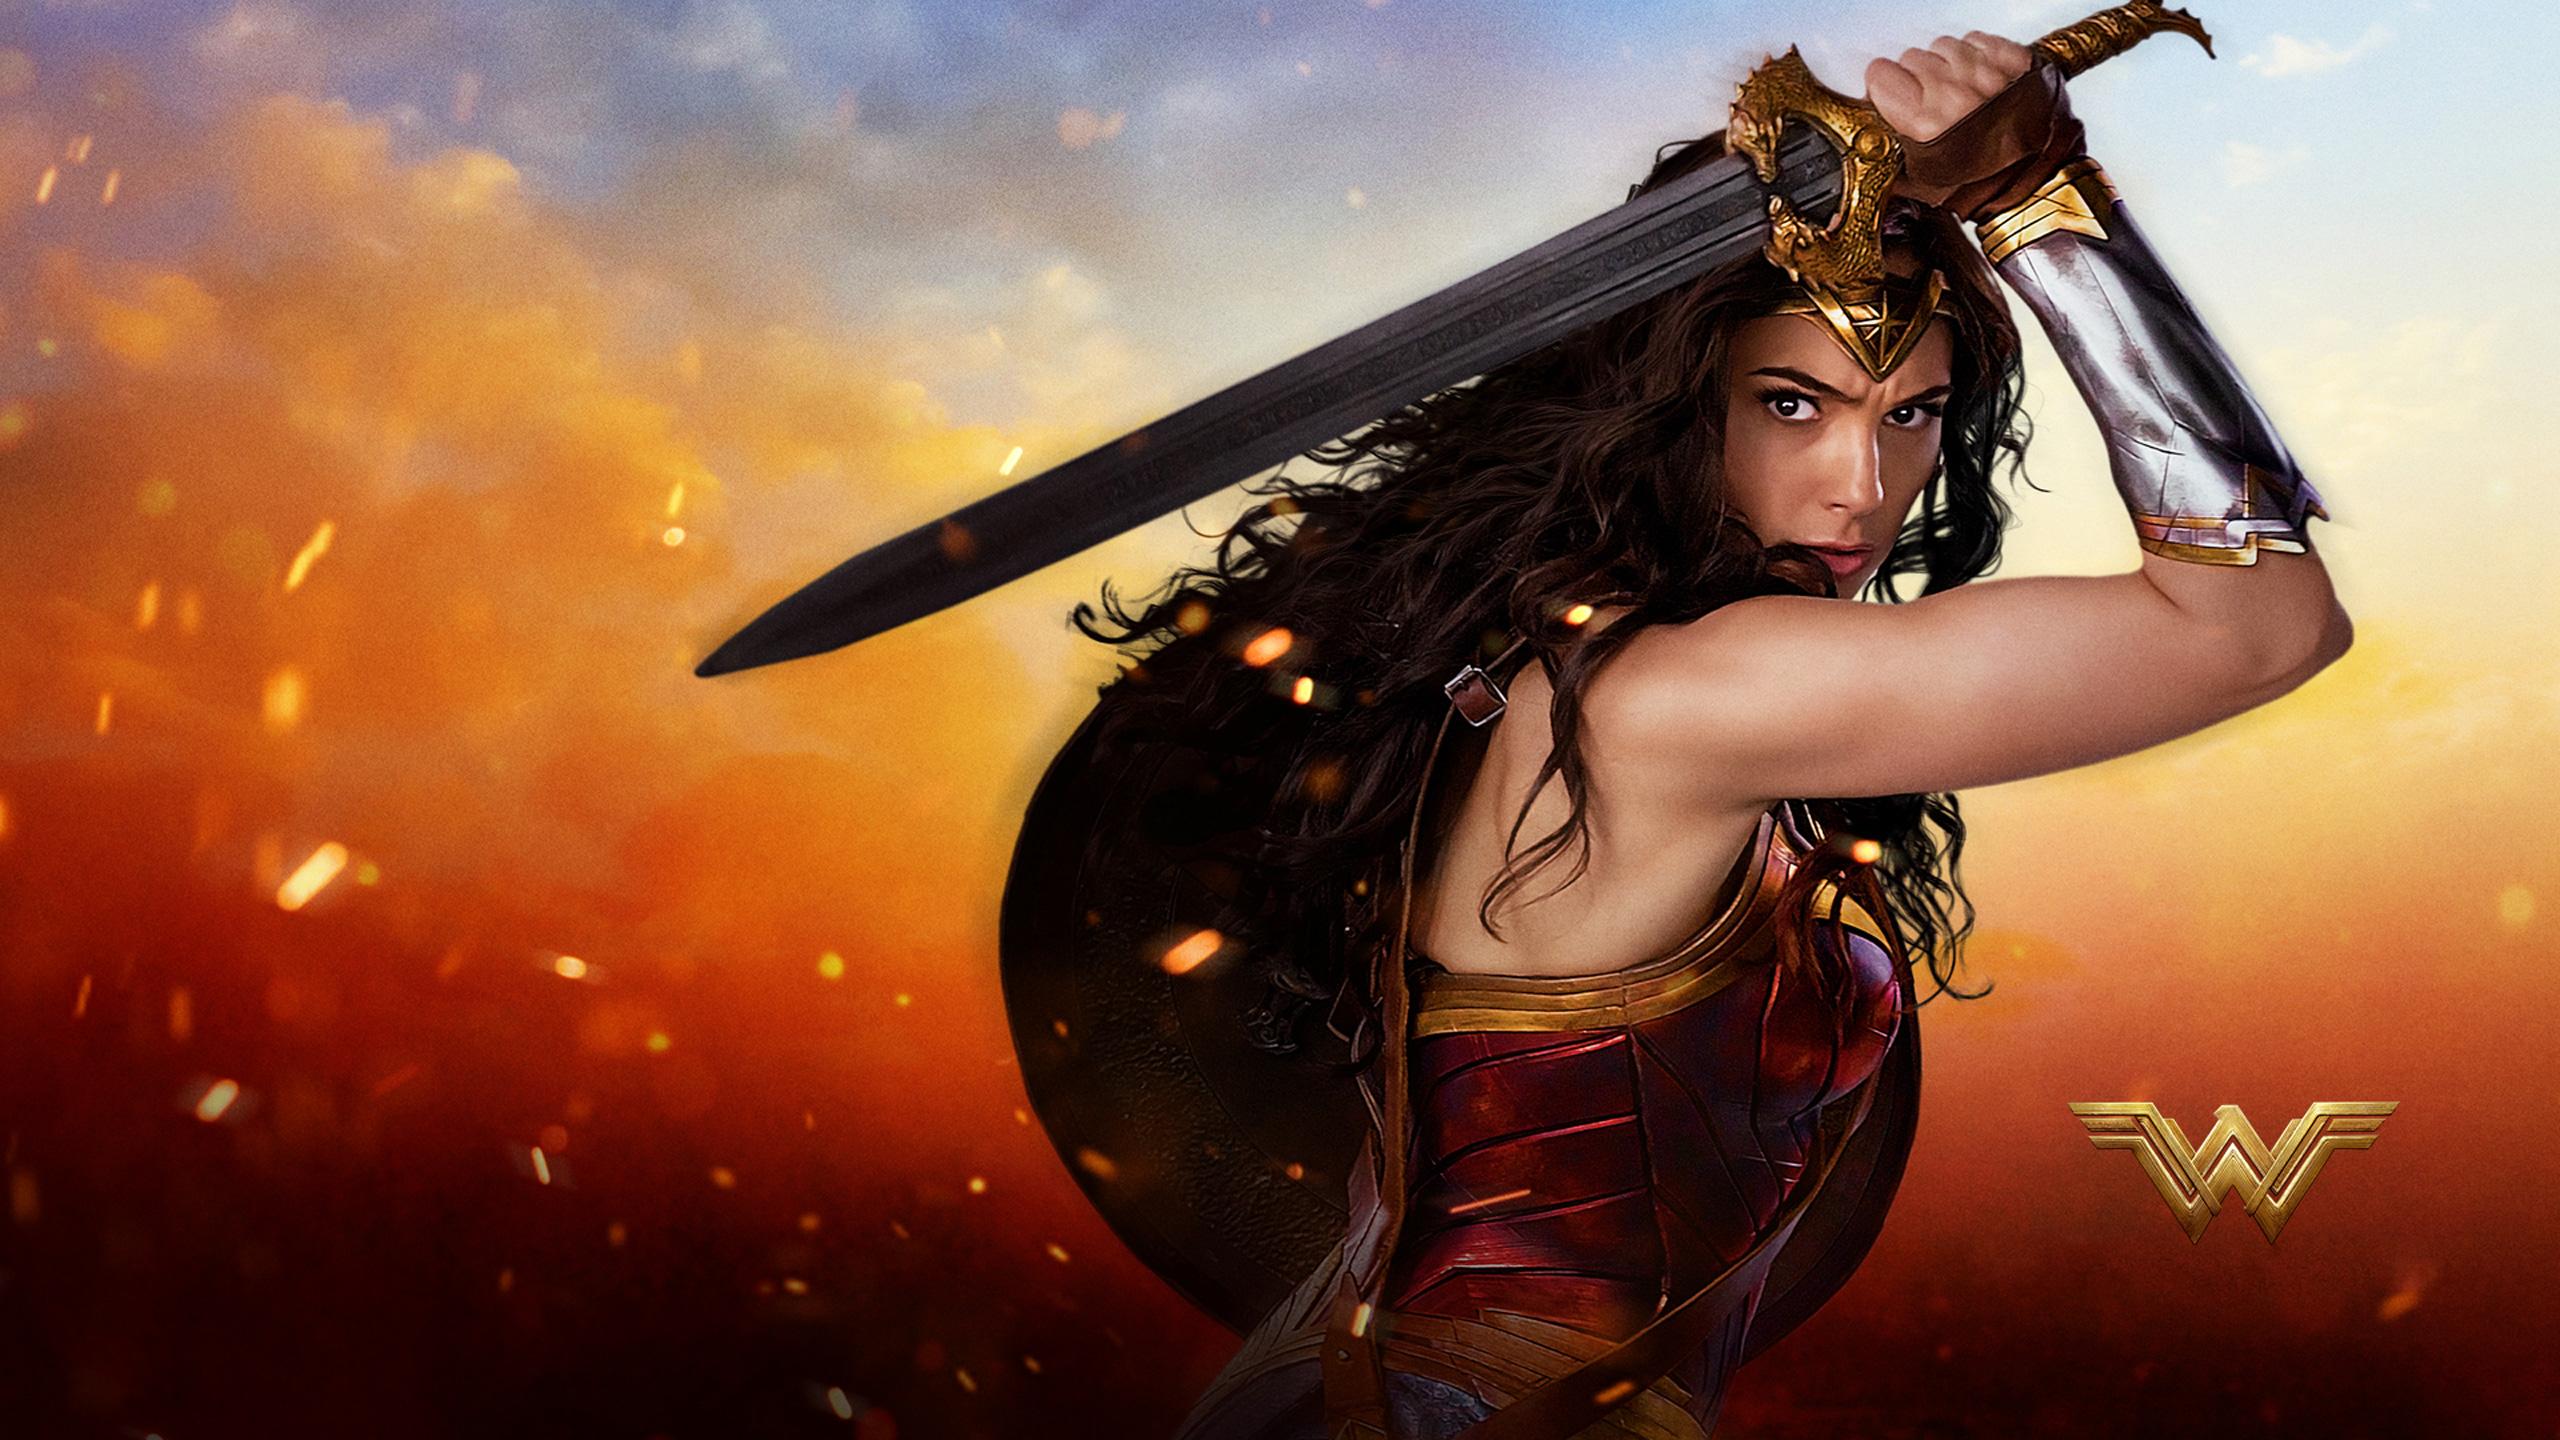 3840x2400 2017 Wonder Woman Hd 4k Hd 4k Wallpapers Images